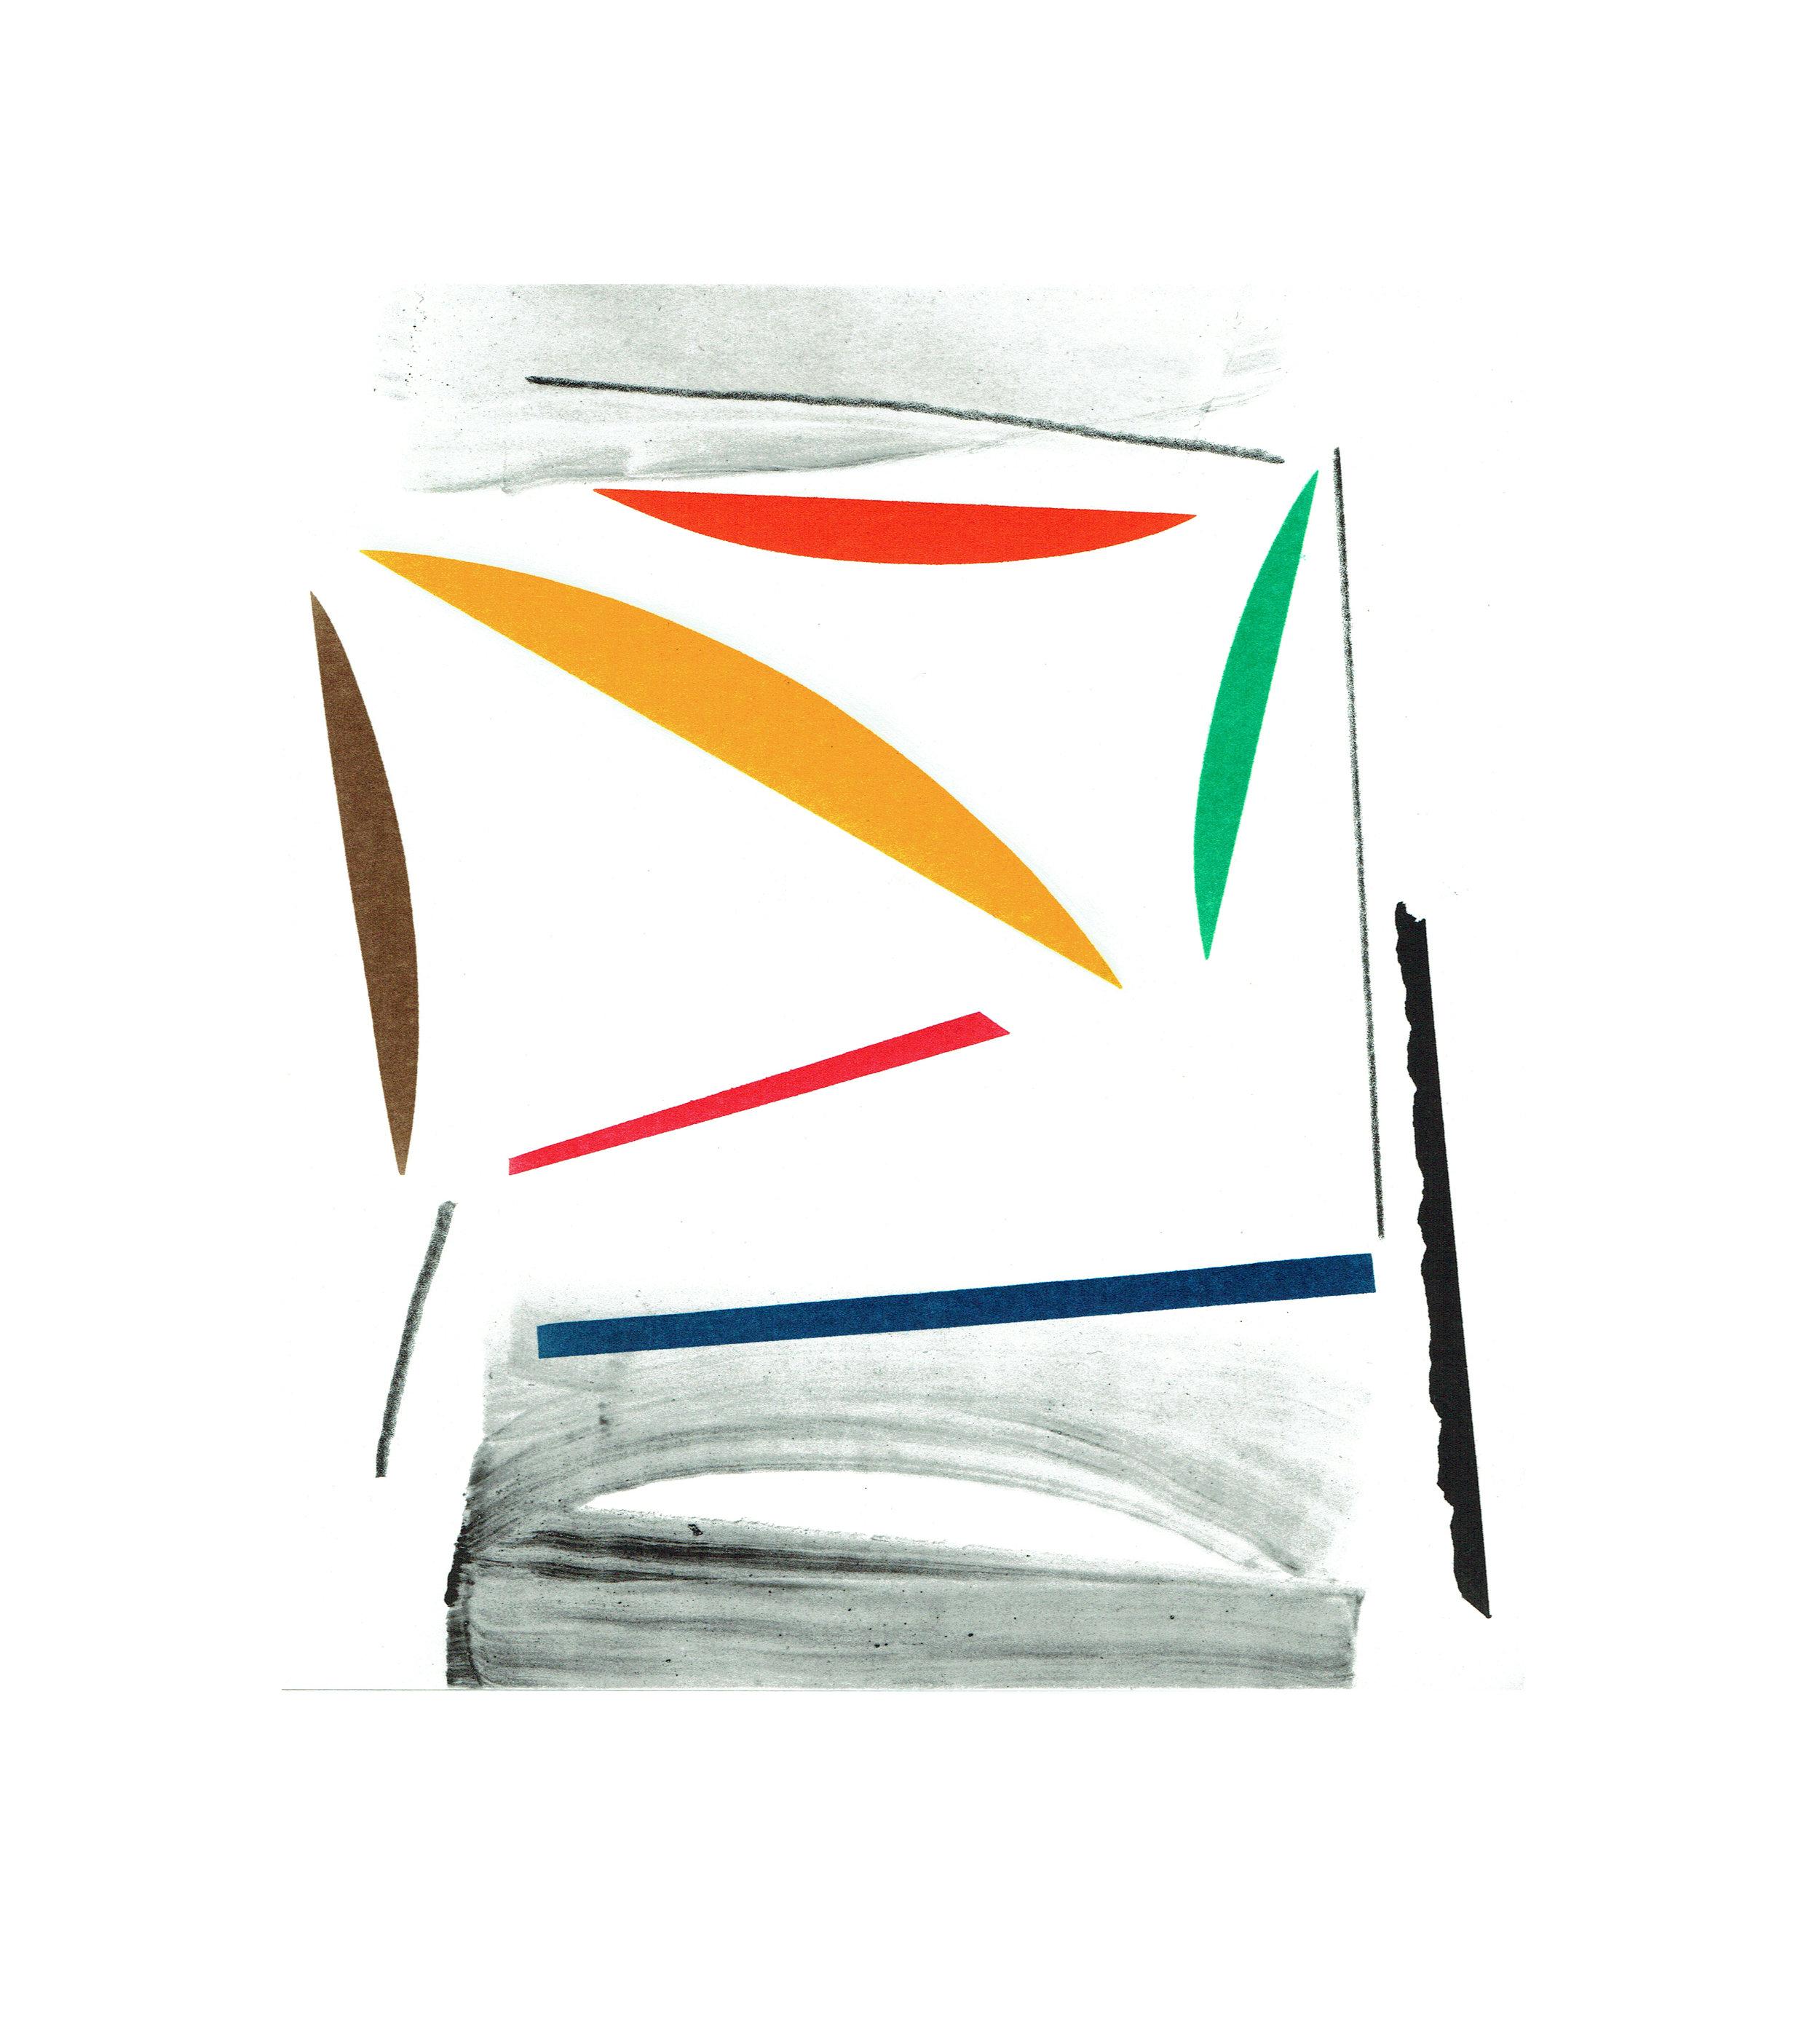 John McLean, Merry Go Round 9    Date: 2016  Size (cm - unframed):  38.2 x 34.4  Technique:  2 plate a la poupee etching  Materials:  Somerset Valvet 300gsm  Edition size:  20  Publisher: The Print Studio  Copyright: The Artist   POA